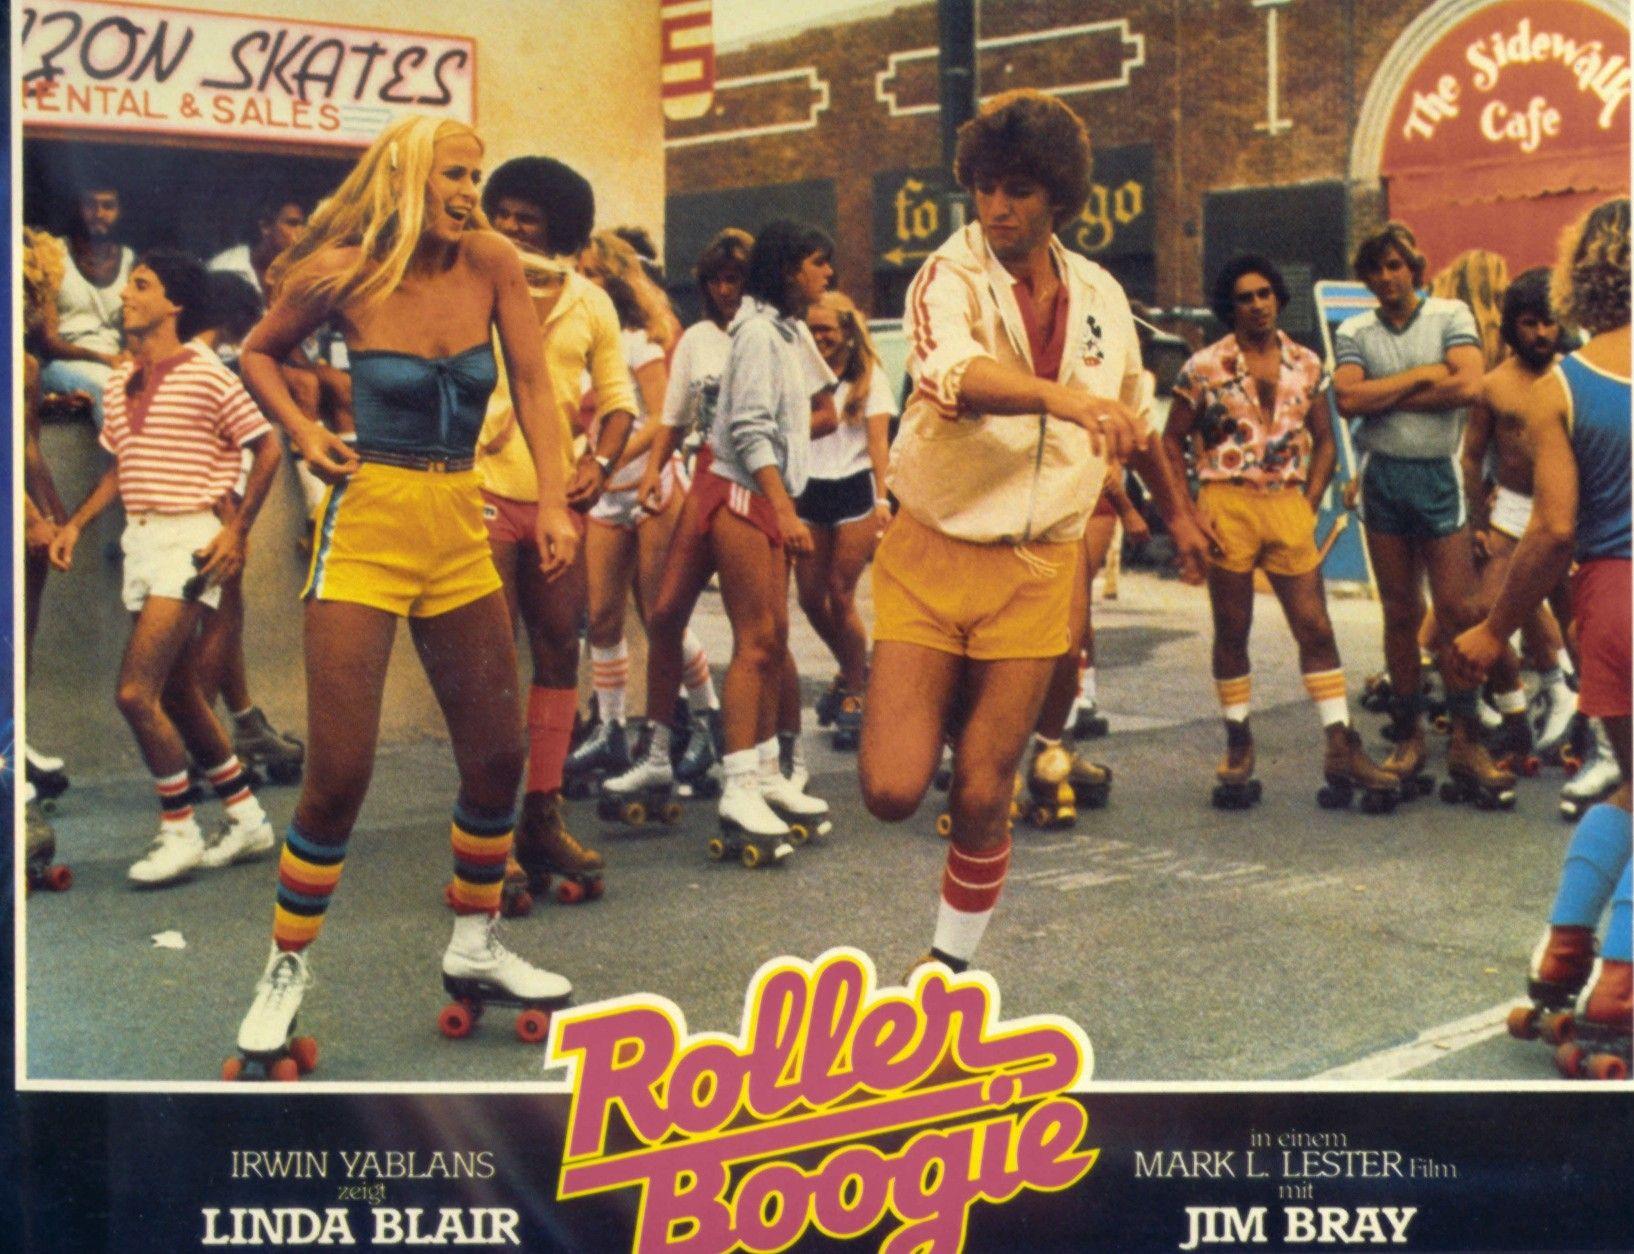 Roller skating rink ontario - Roller Skate Disco 1970s 1980s